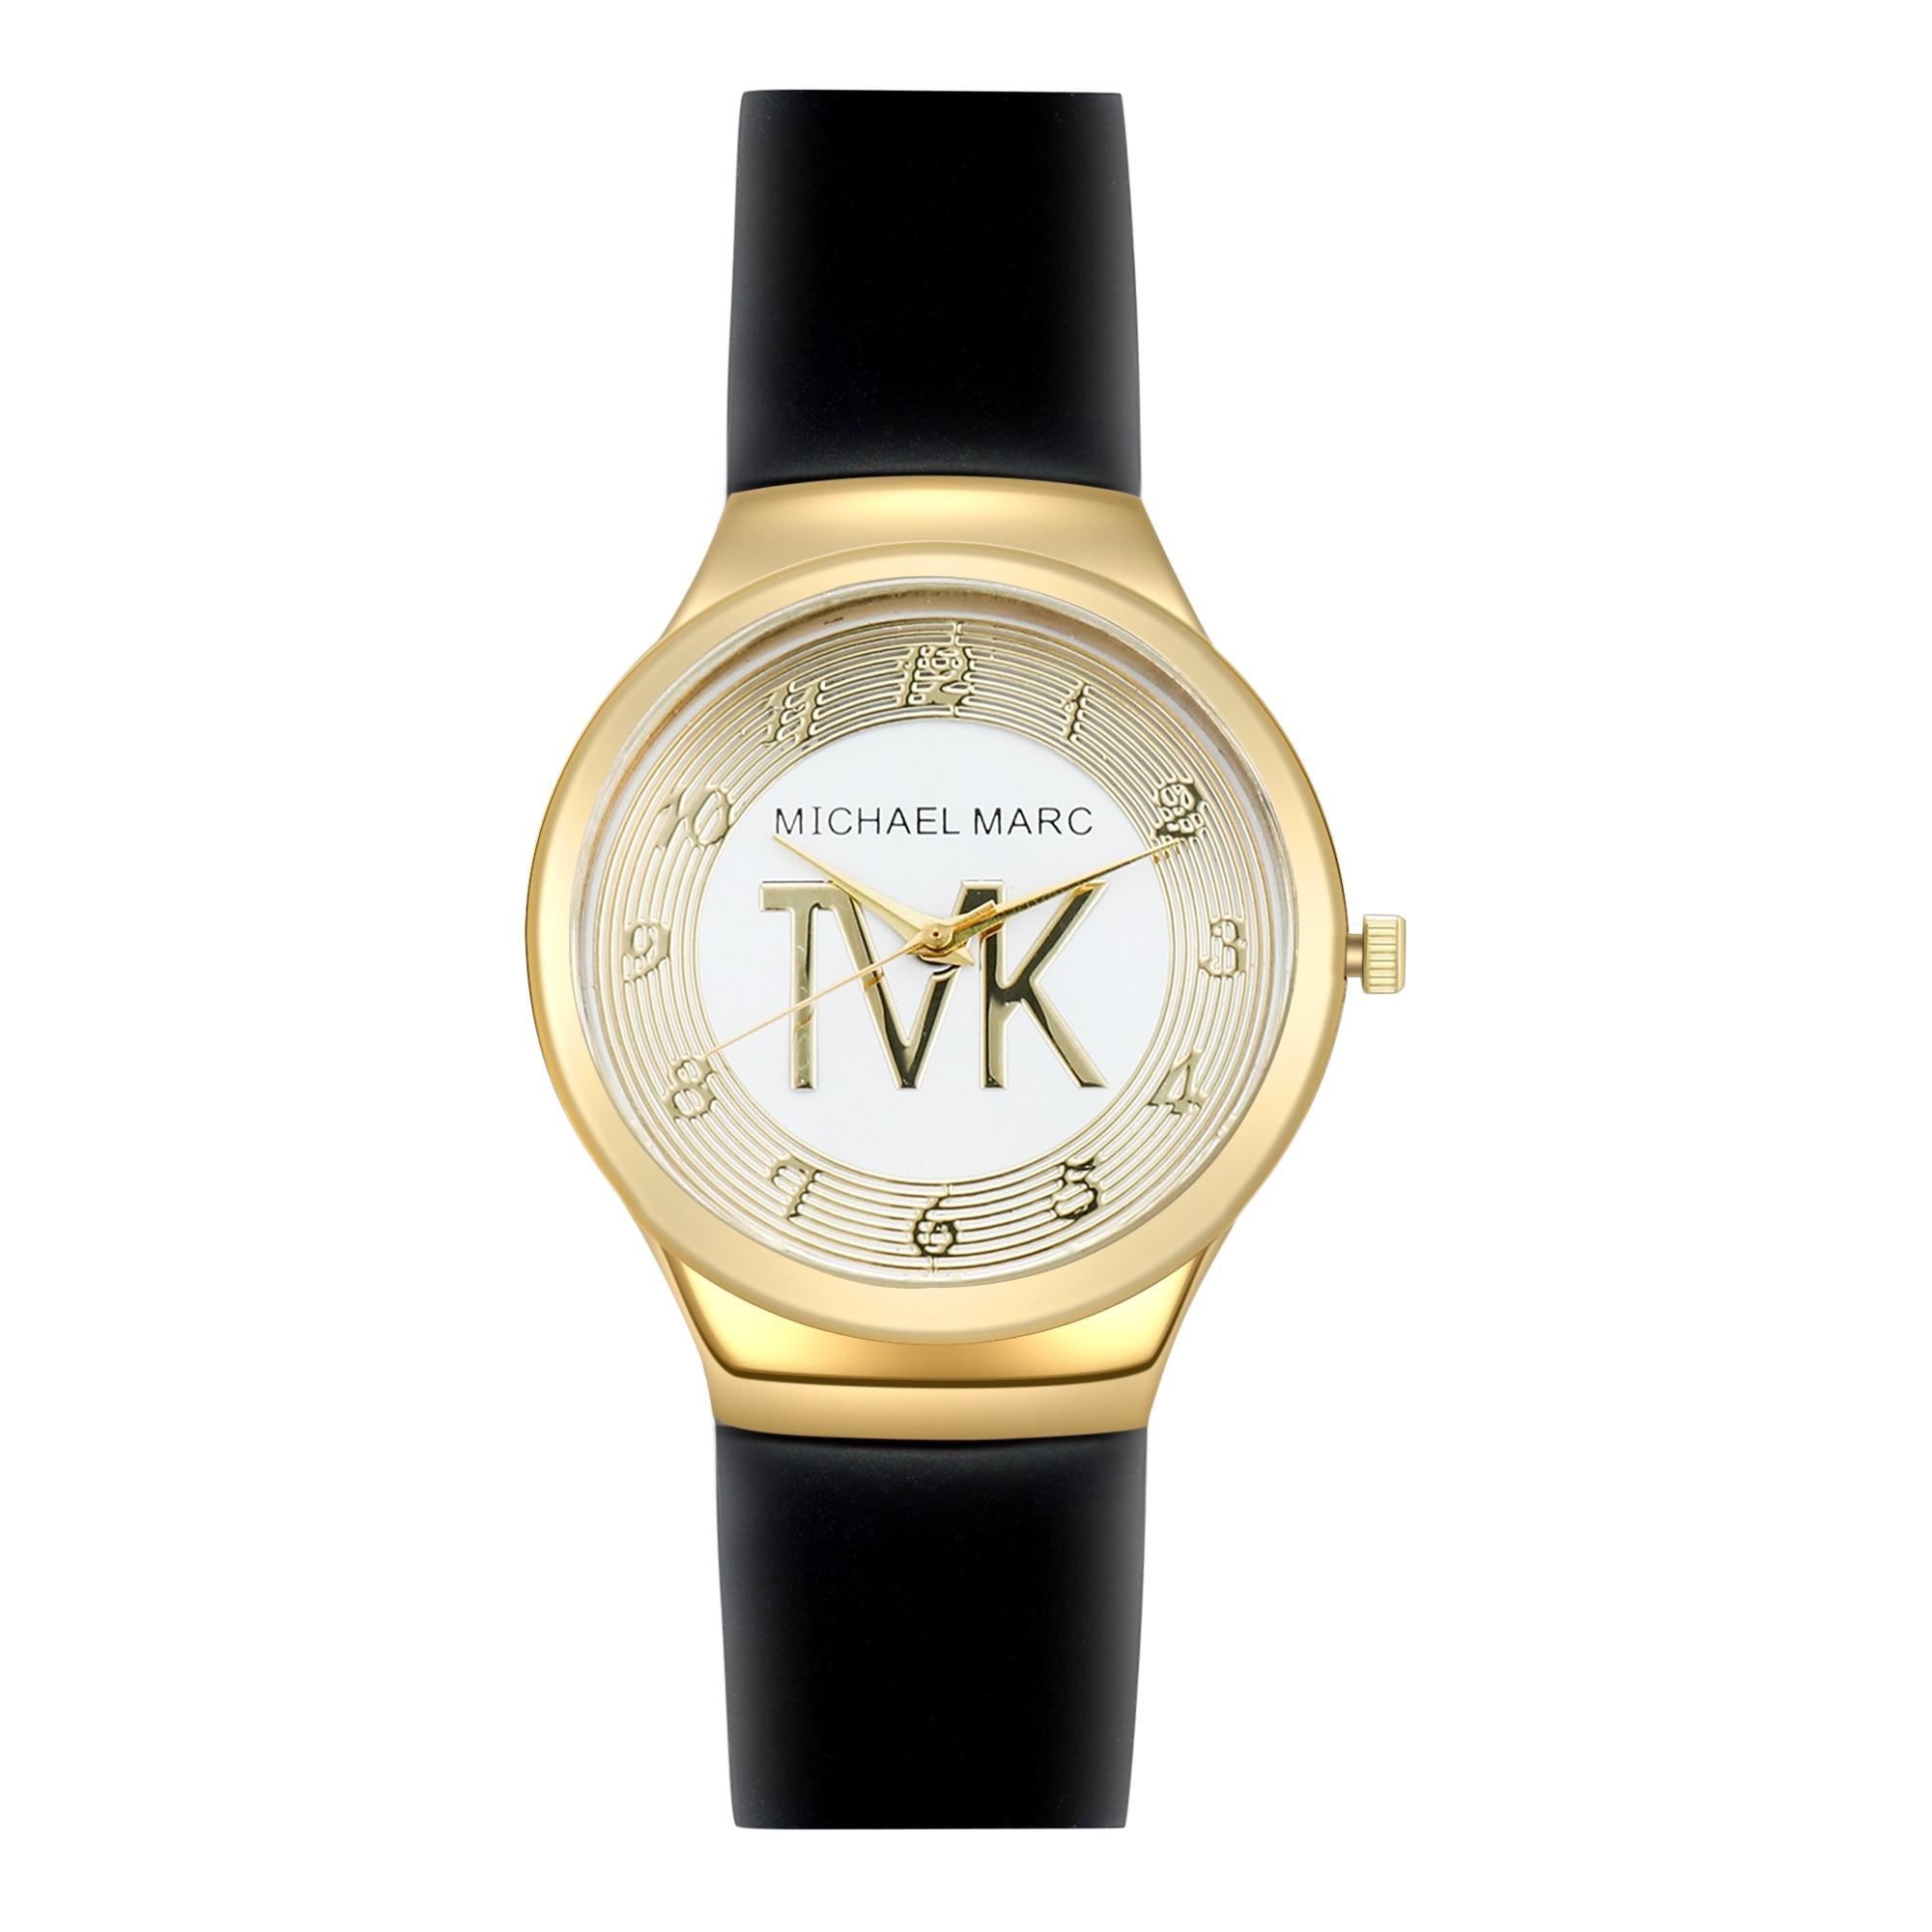 Hot Brand TVK Silicone Women Watches Relogios Femininos Quartz Watch Men Women Watches Bear Clock Relojes Hombre